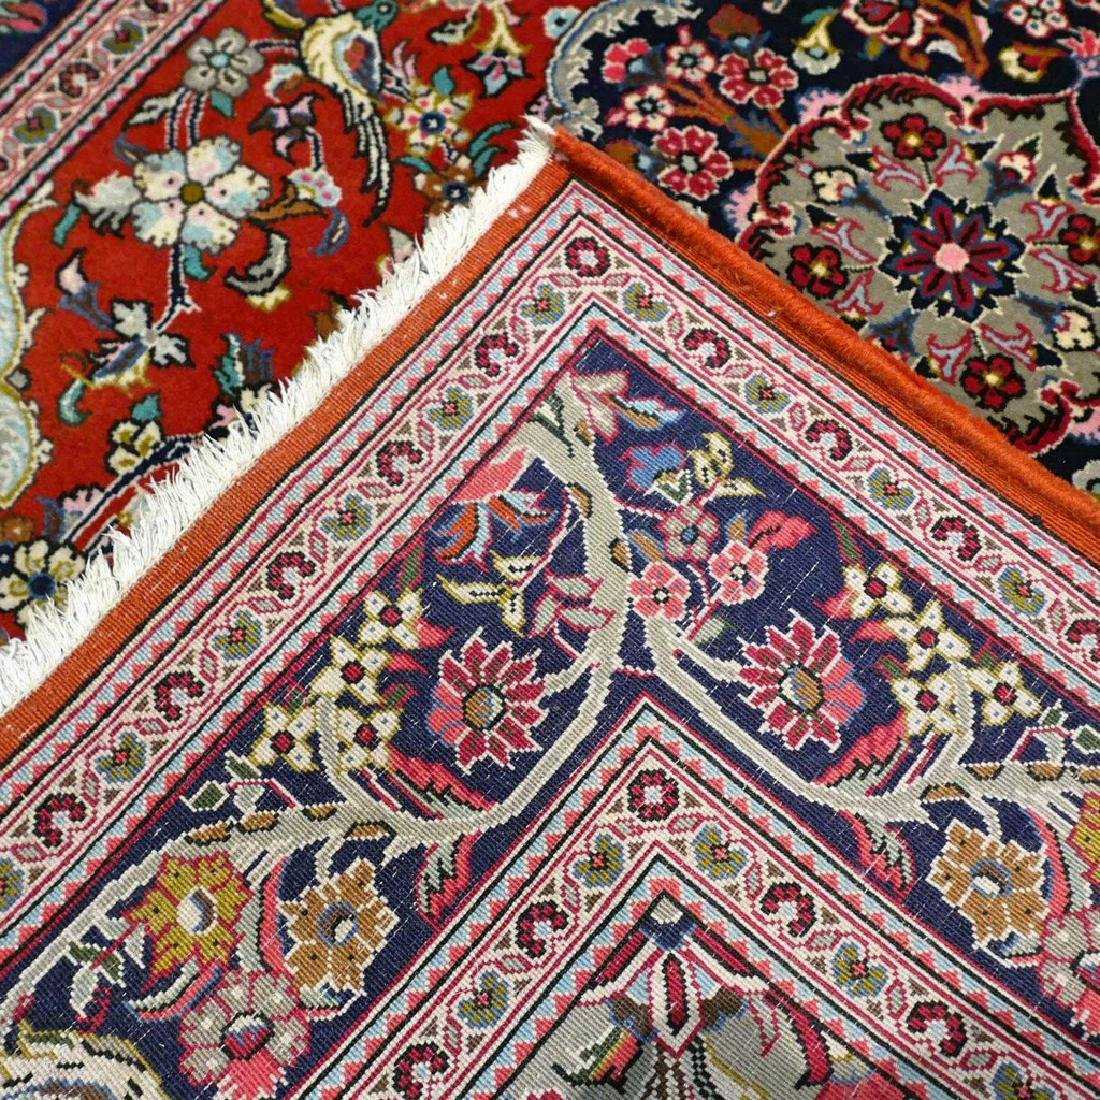 Qum Kork Wool on Cotton Rug 5.4x3.6 - 2